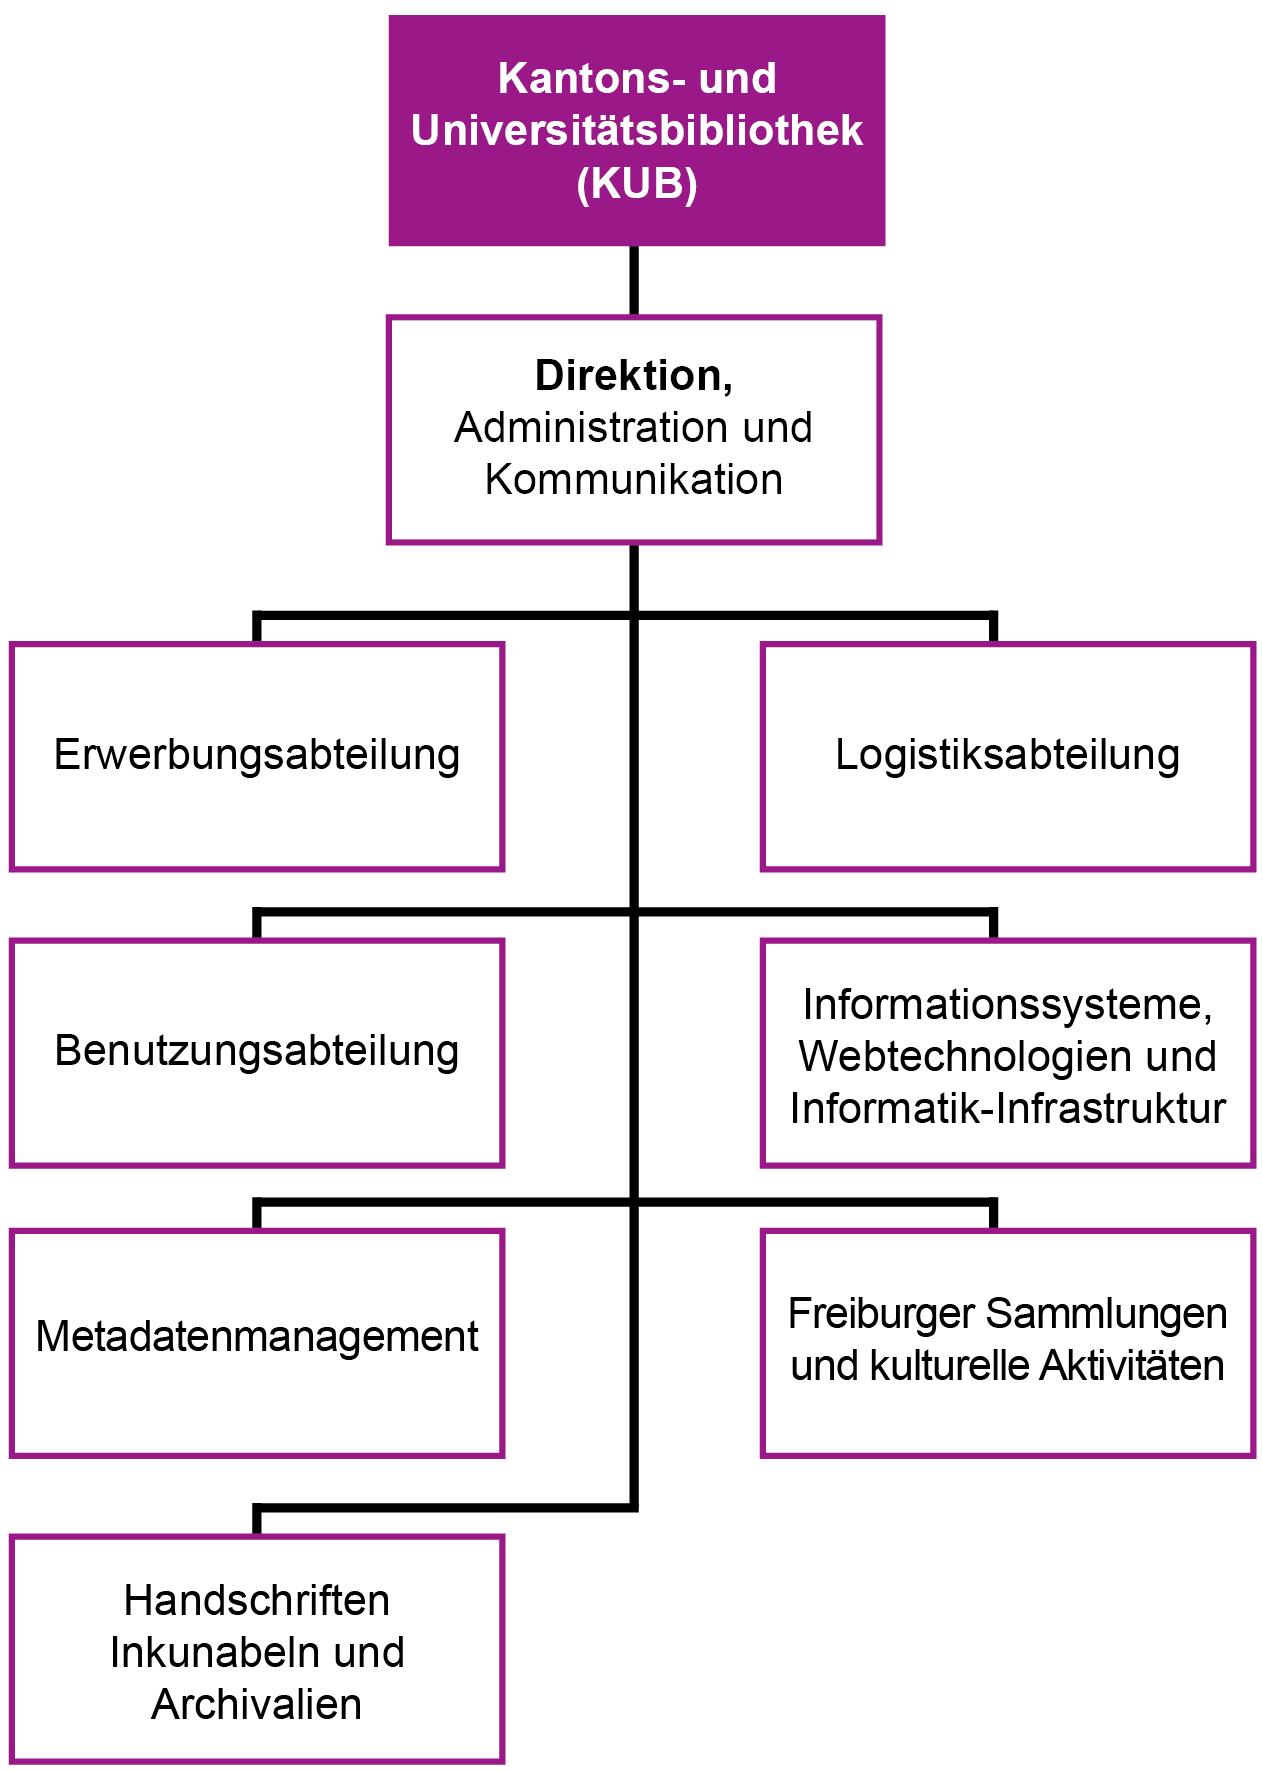 KUB Freiburg - Organigramm